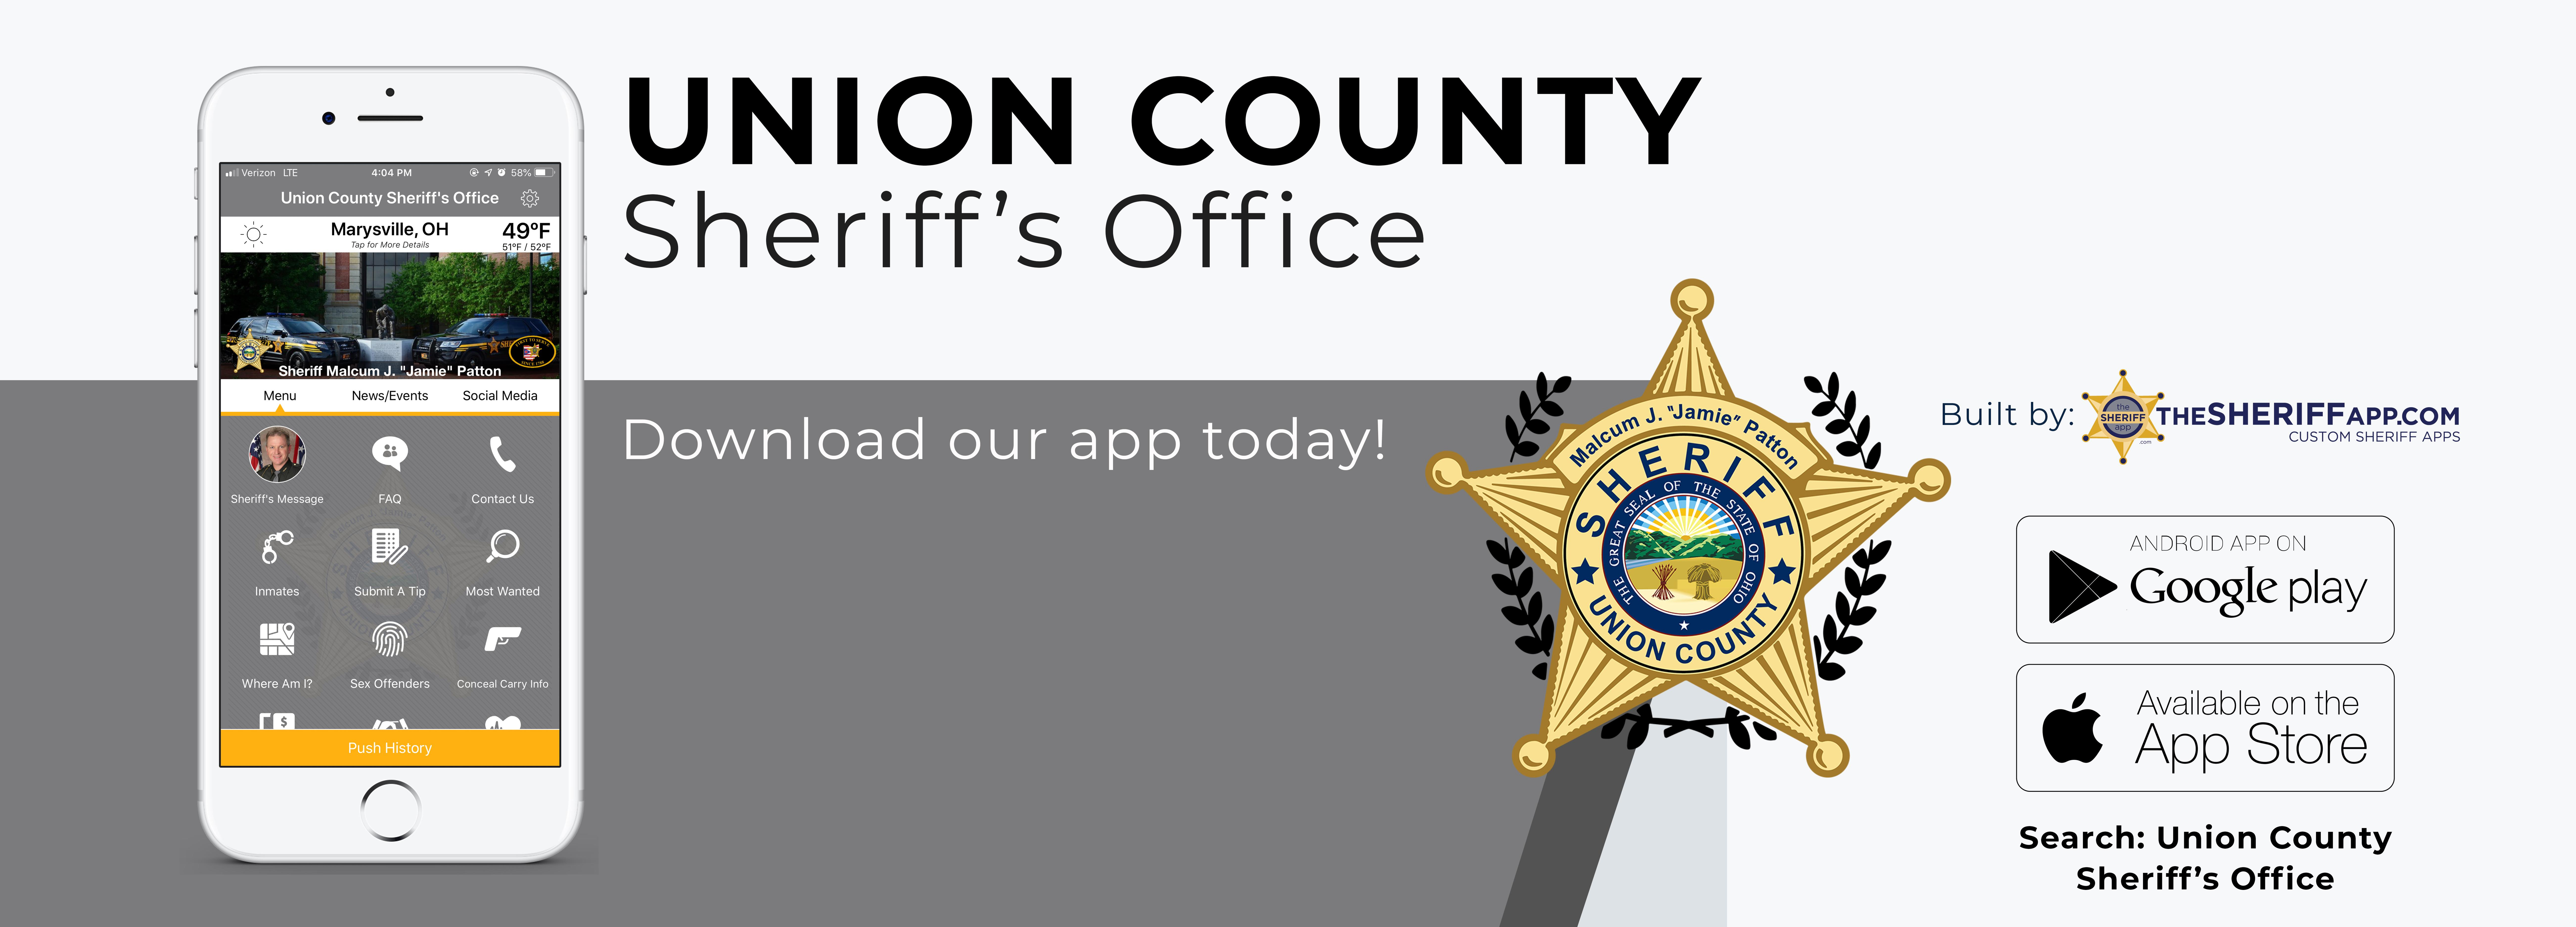 Union County, OhioSheriff Main